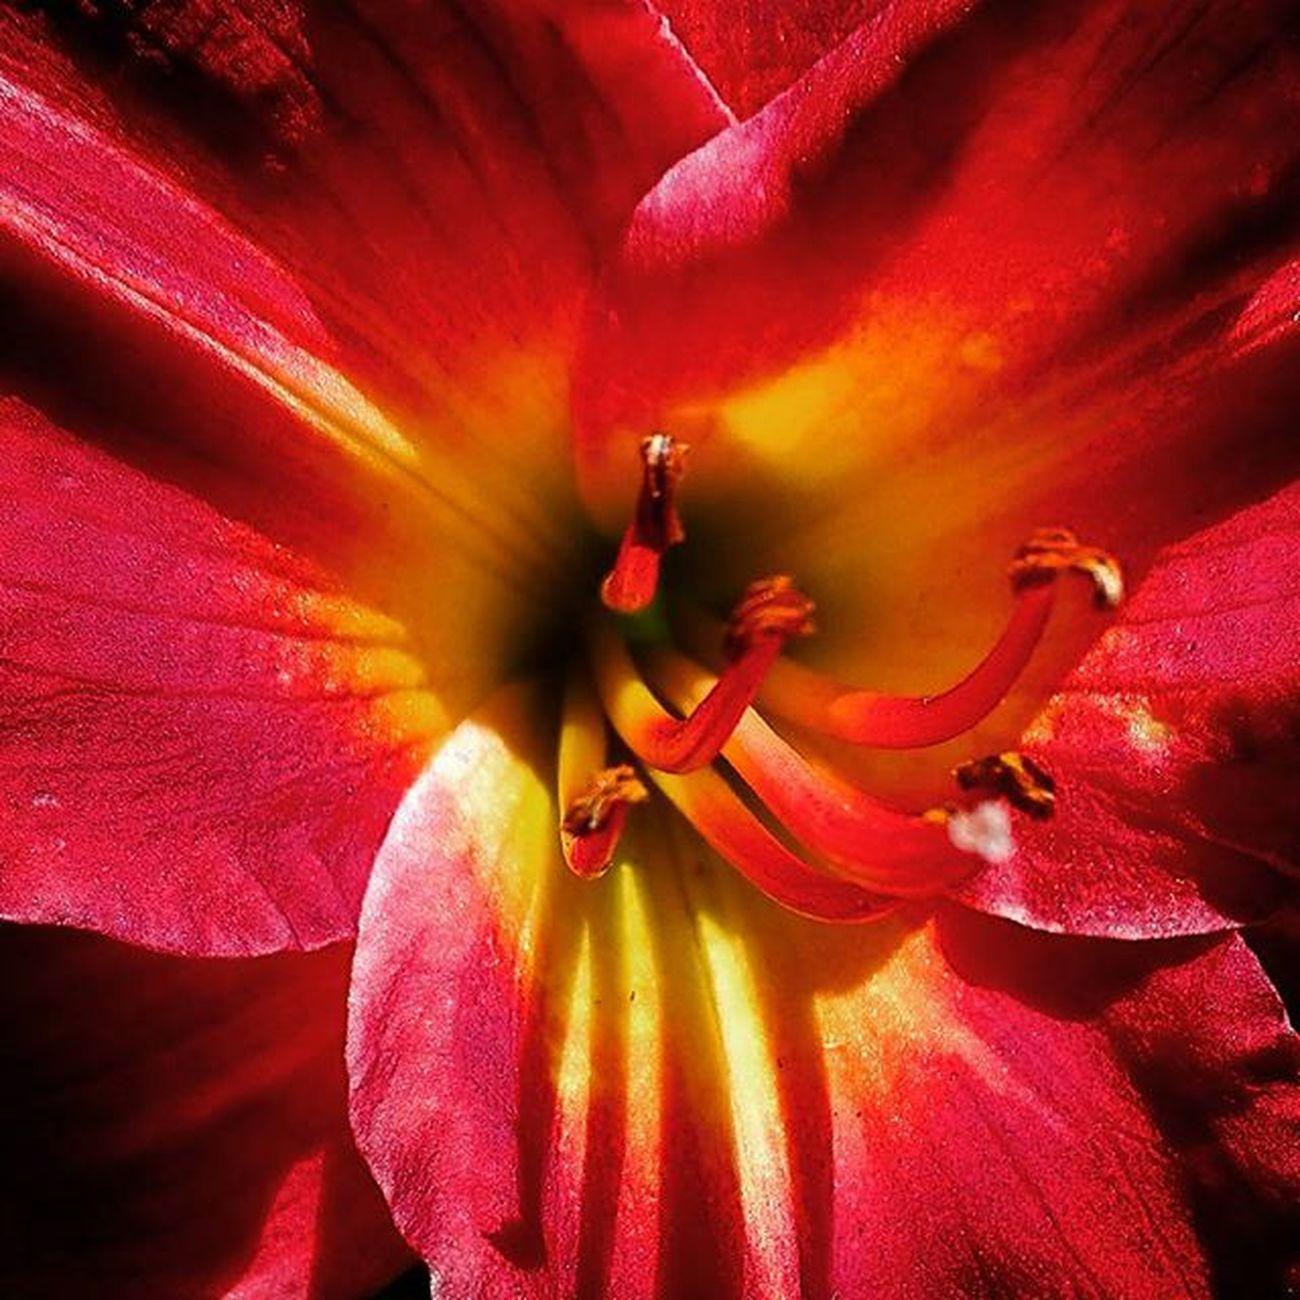 Flower Nature Flowersandmacro Af_floral➡🌼flowers Red 9Vaga_ColorRed9 Pocket_colors Rainbow Wall bowMacroworld_tr Tt_wt_rflora Ptk_flowers_red1 Hello_red